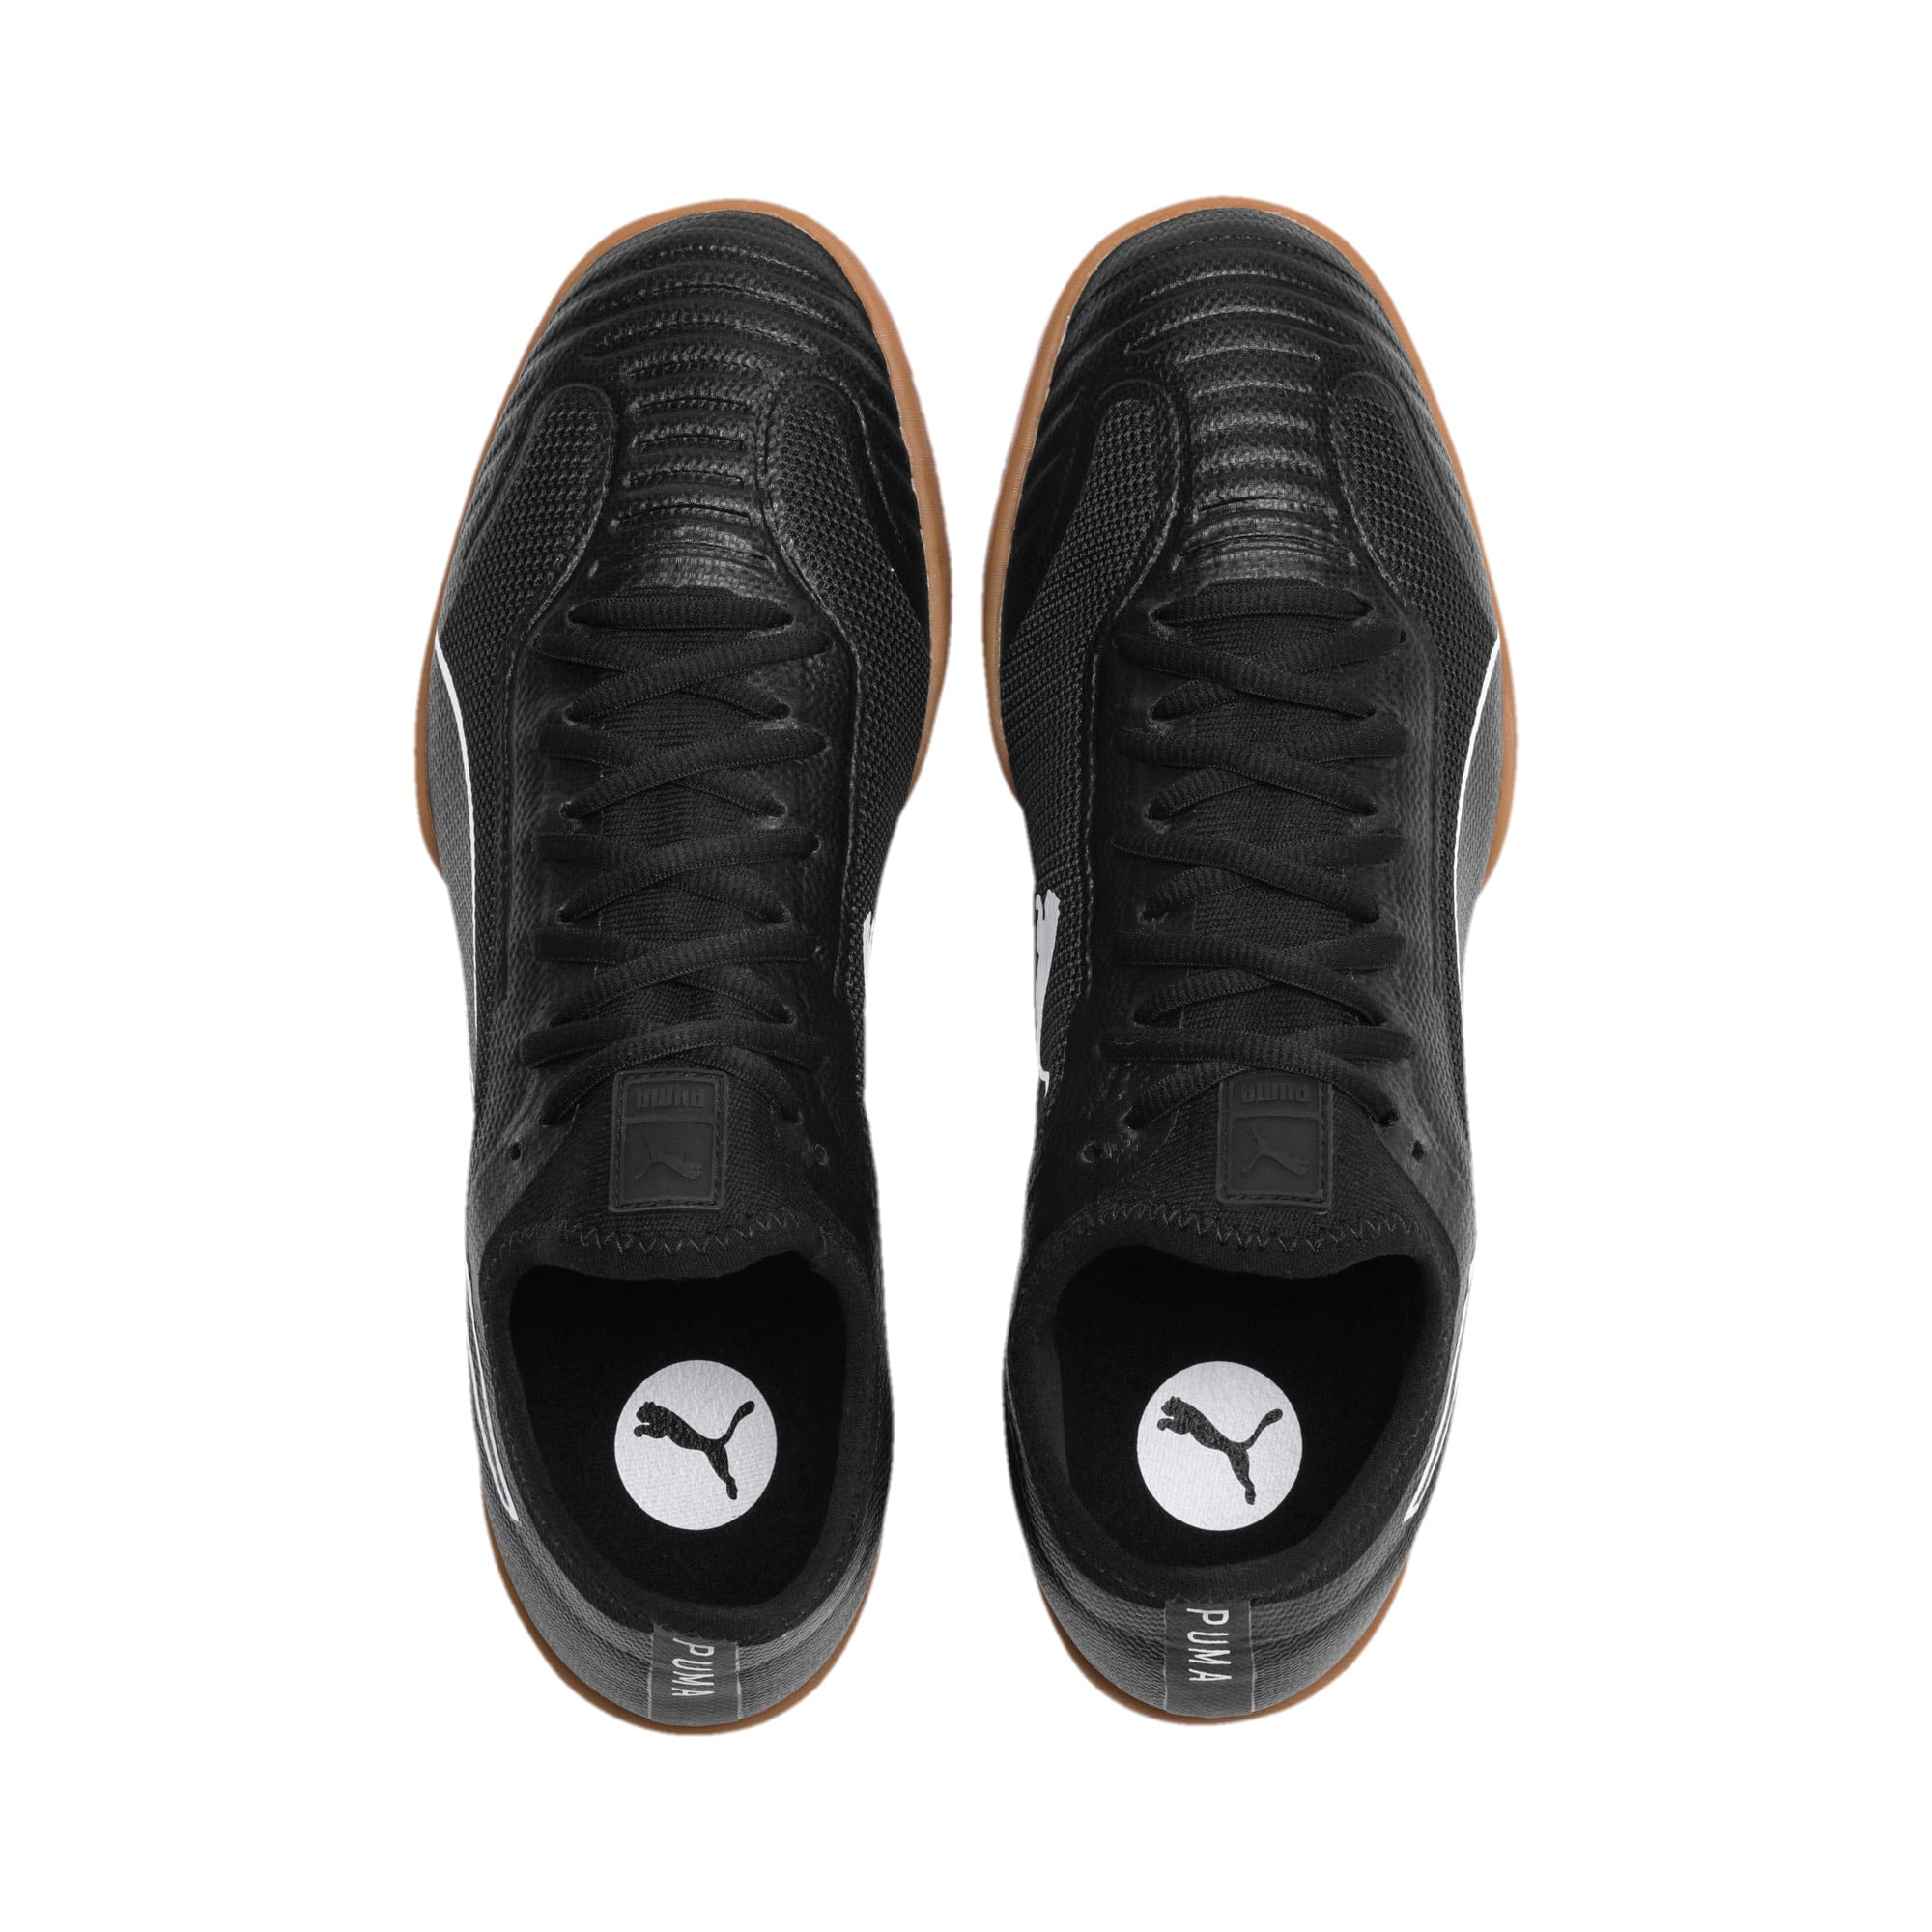 Thumbnail 7 of 365 Sala 1 Men's Soccer Shoes, Puma Black-Puma White-Gum, medium